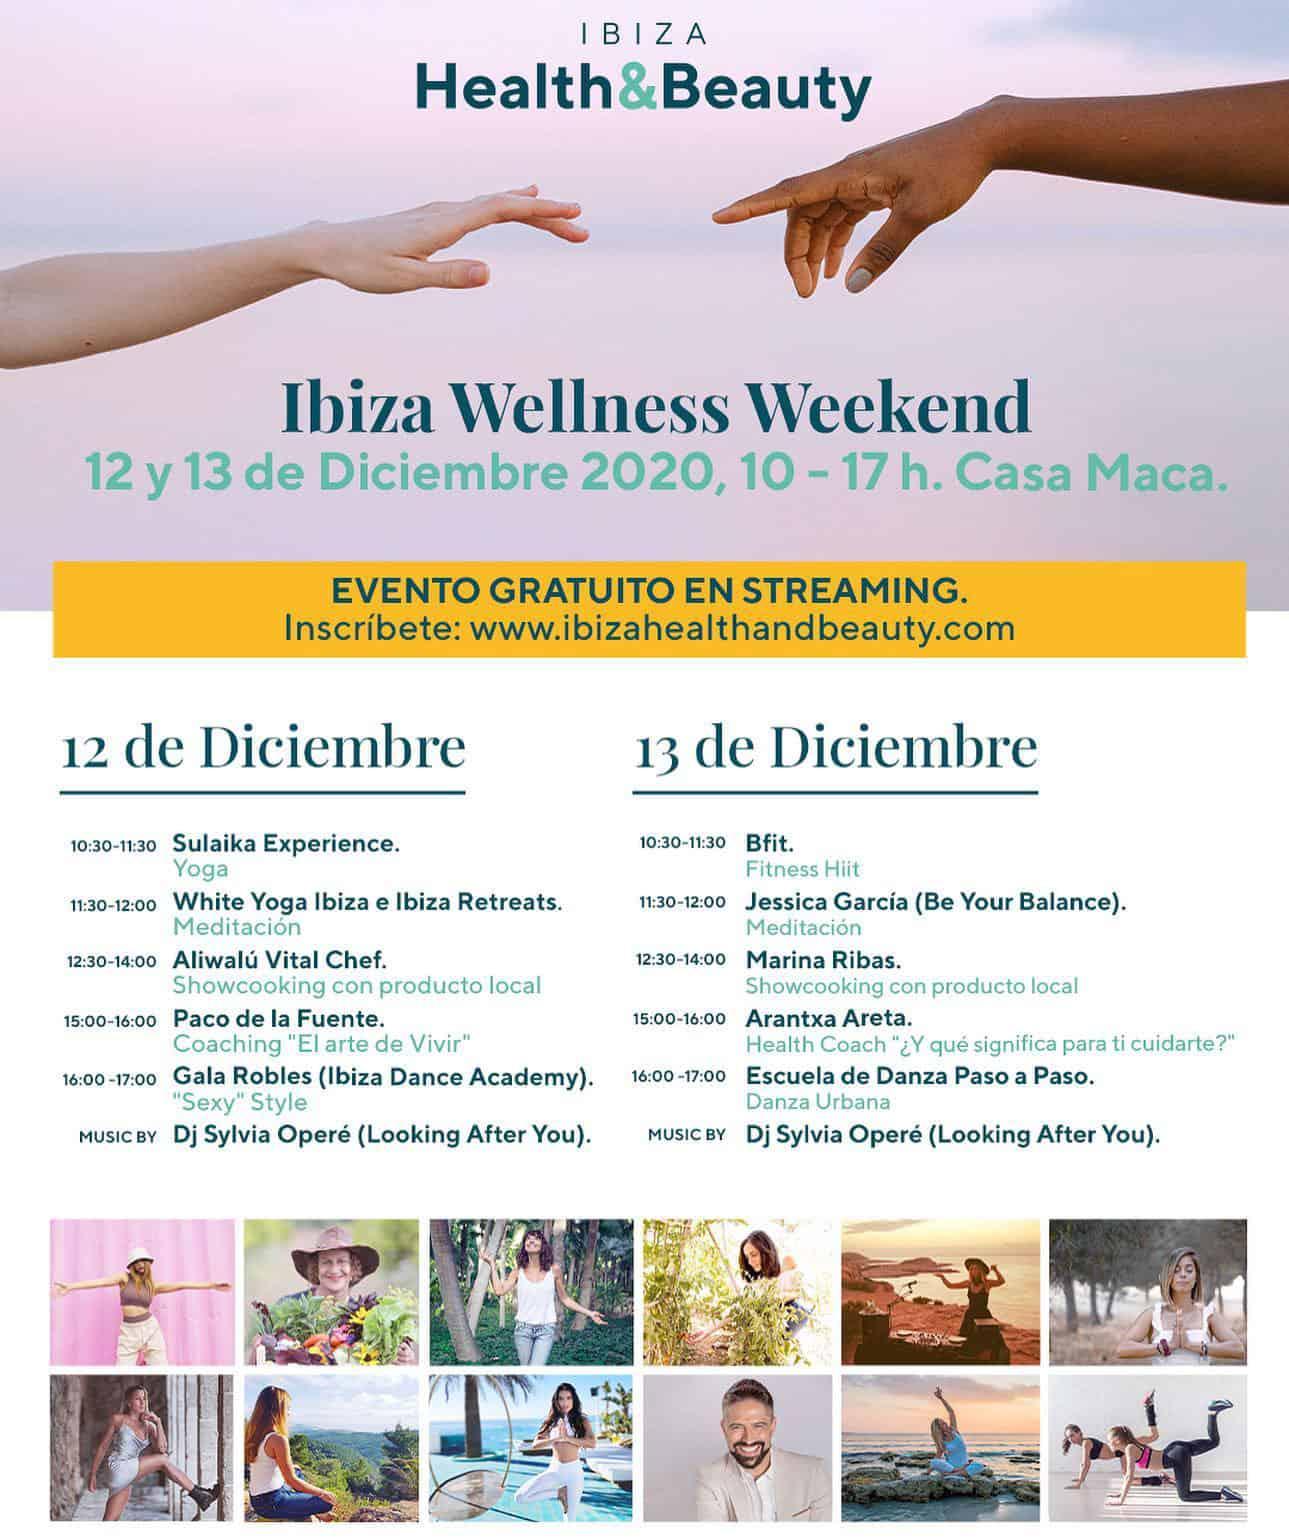 programa-ibiza-wellness-weekend-2020-casa-maca-ibiza-welcometoibiza